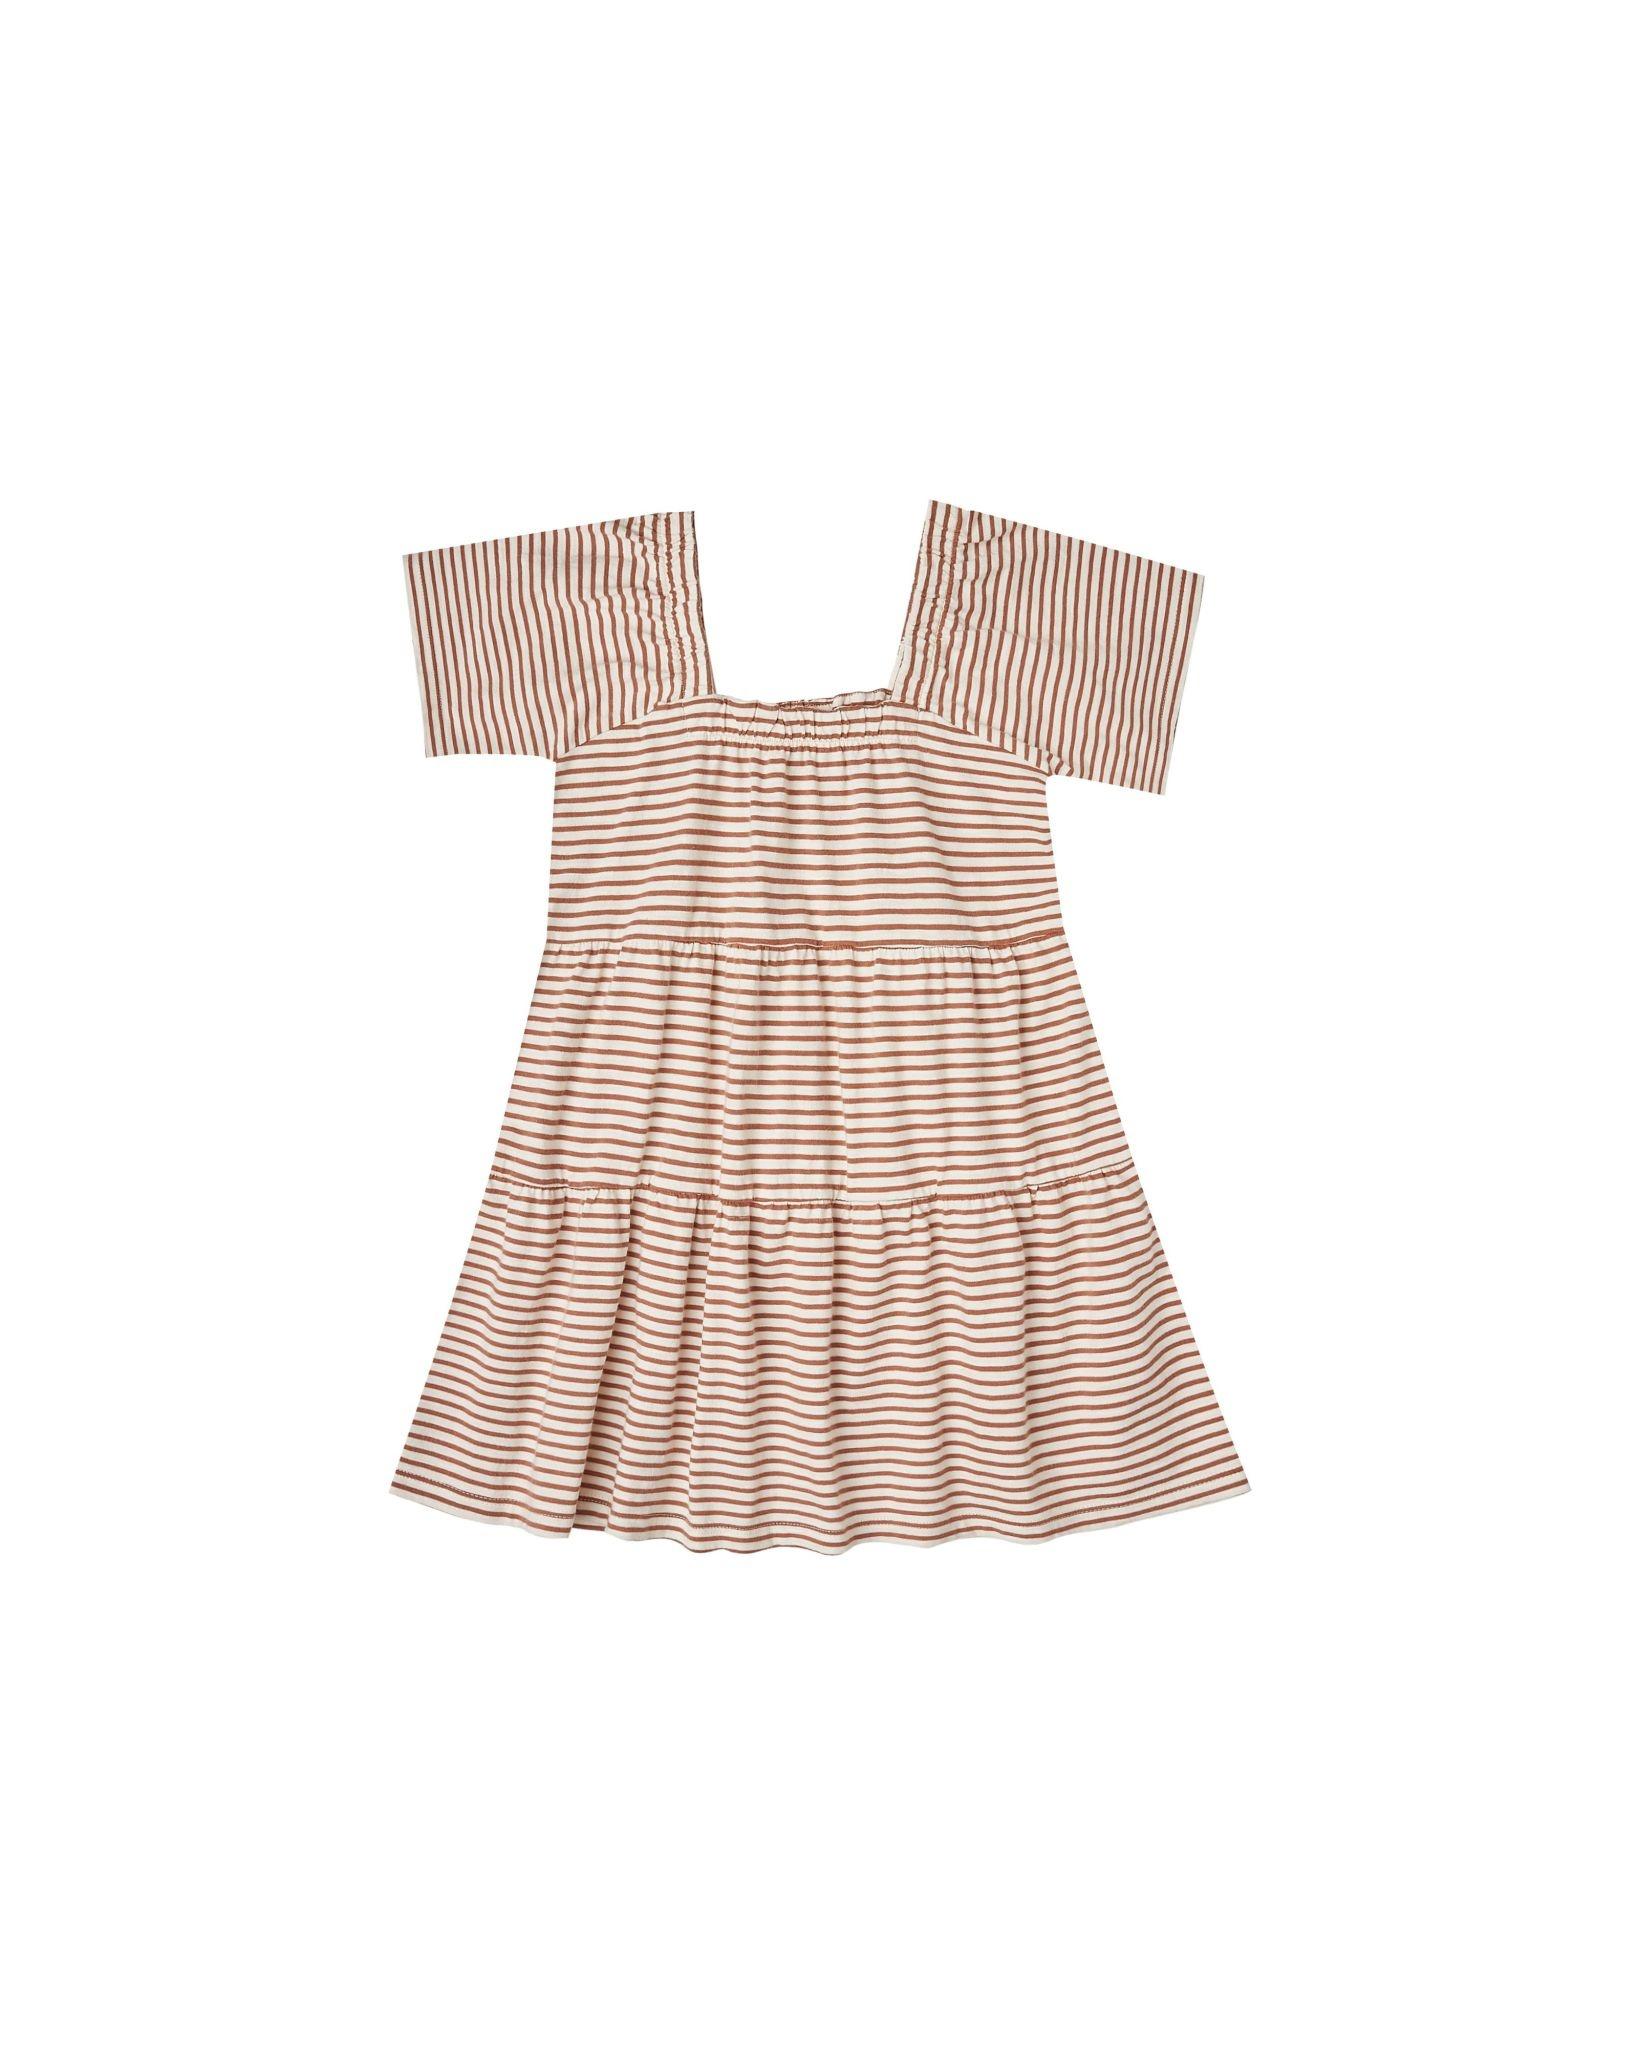 Rylee & Cru Amber Striped Agnes Dress